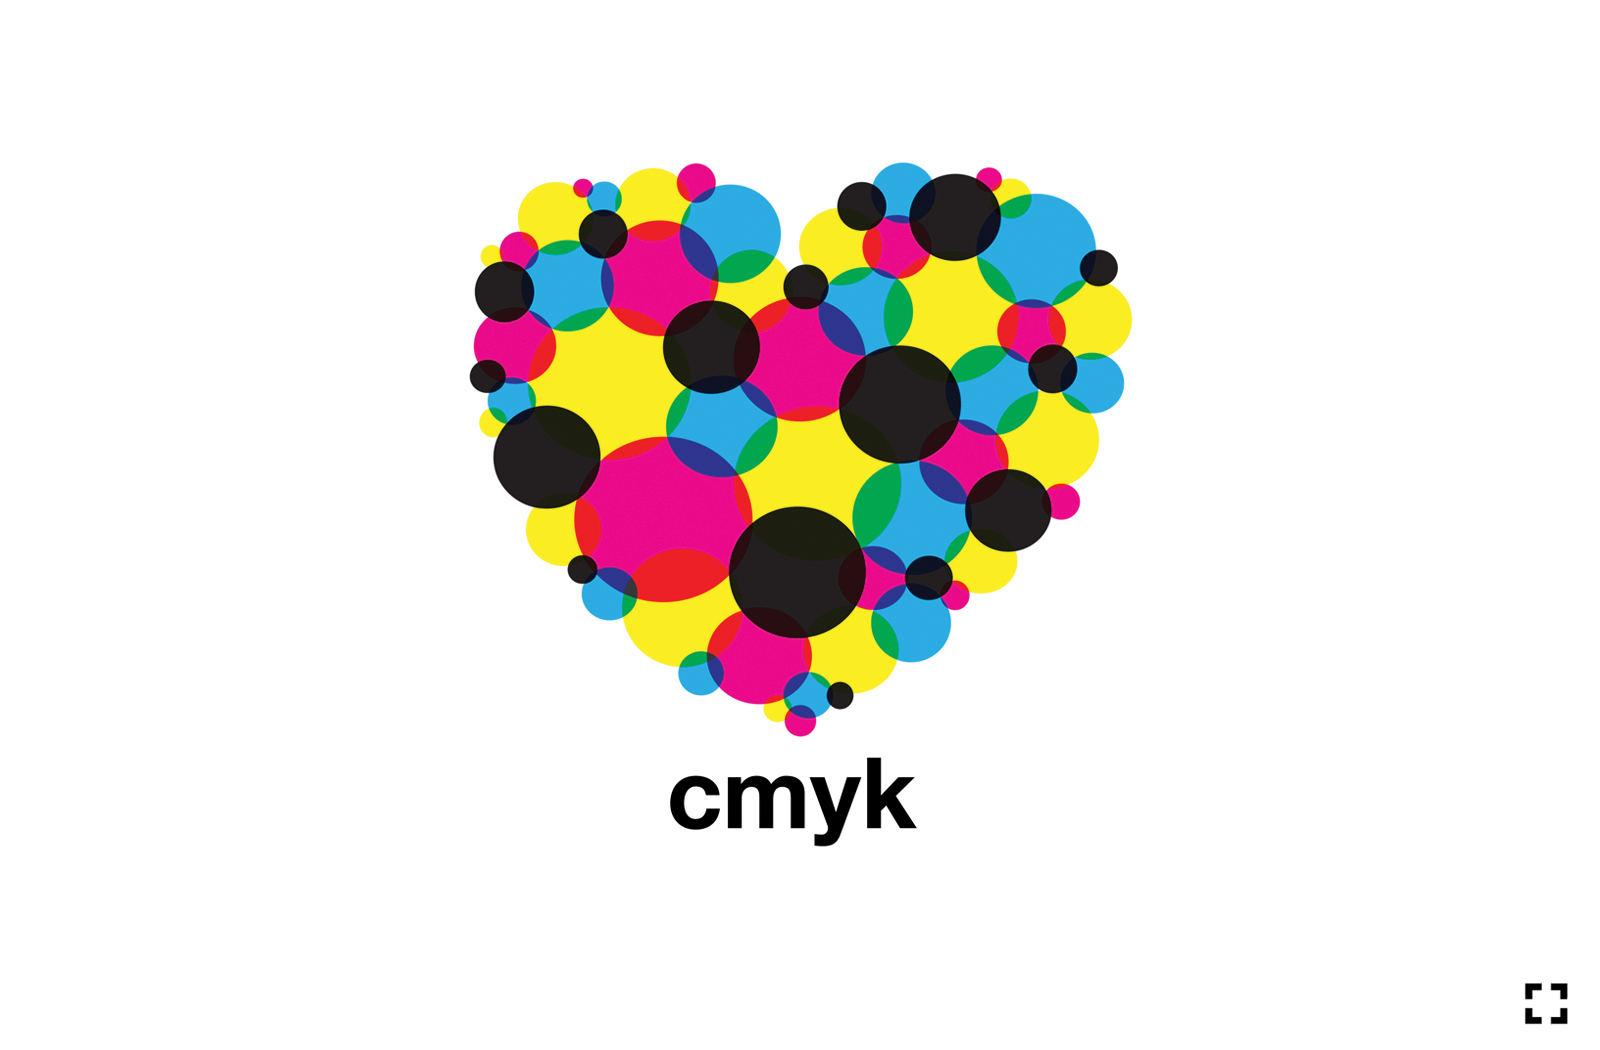 cmyk wallpaper 9 of - photo #18